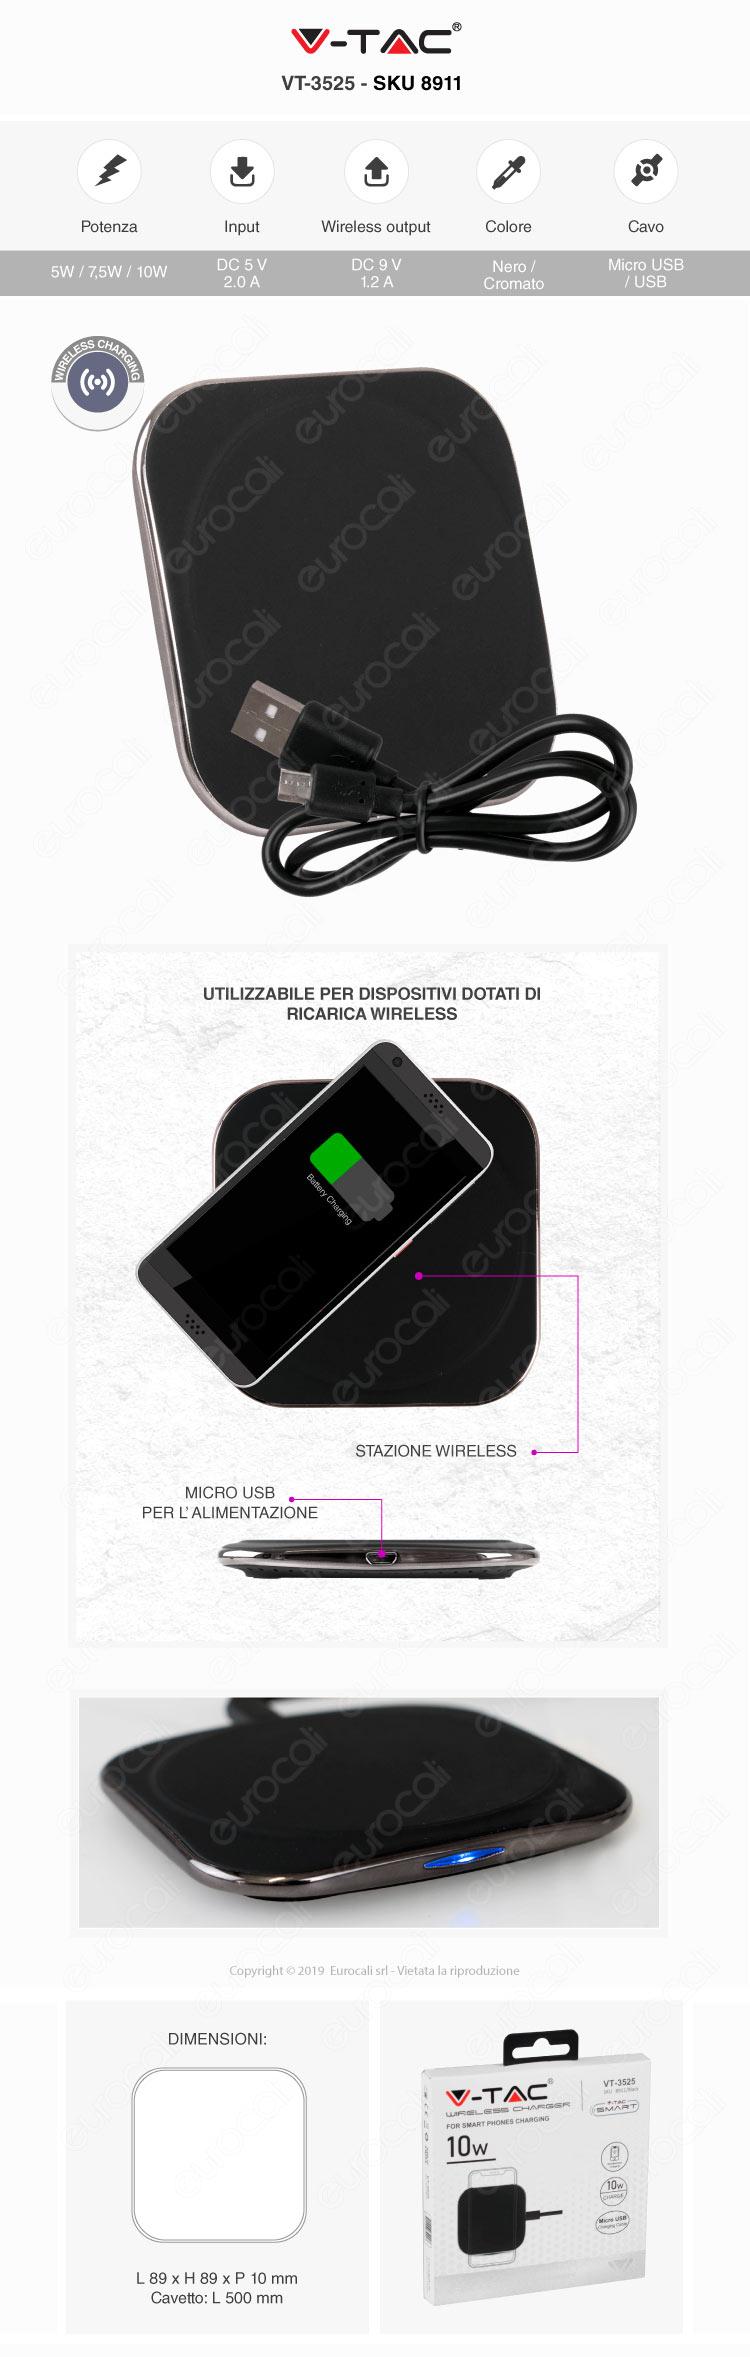 V-Tac VT-3525 Caricatore Wireless 10W